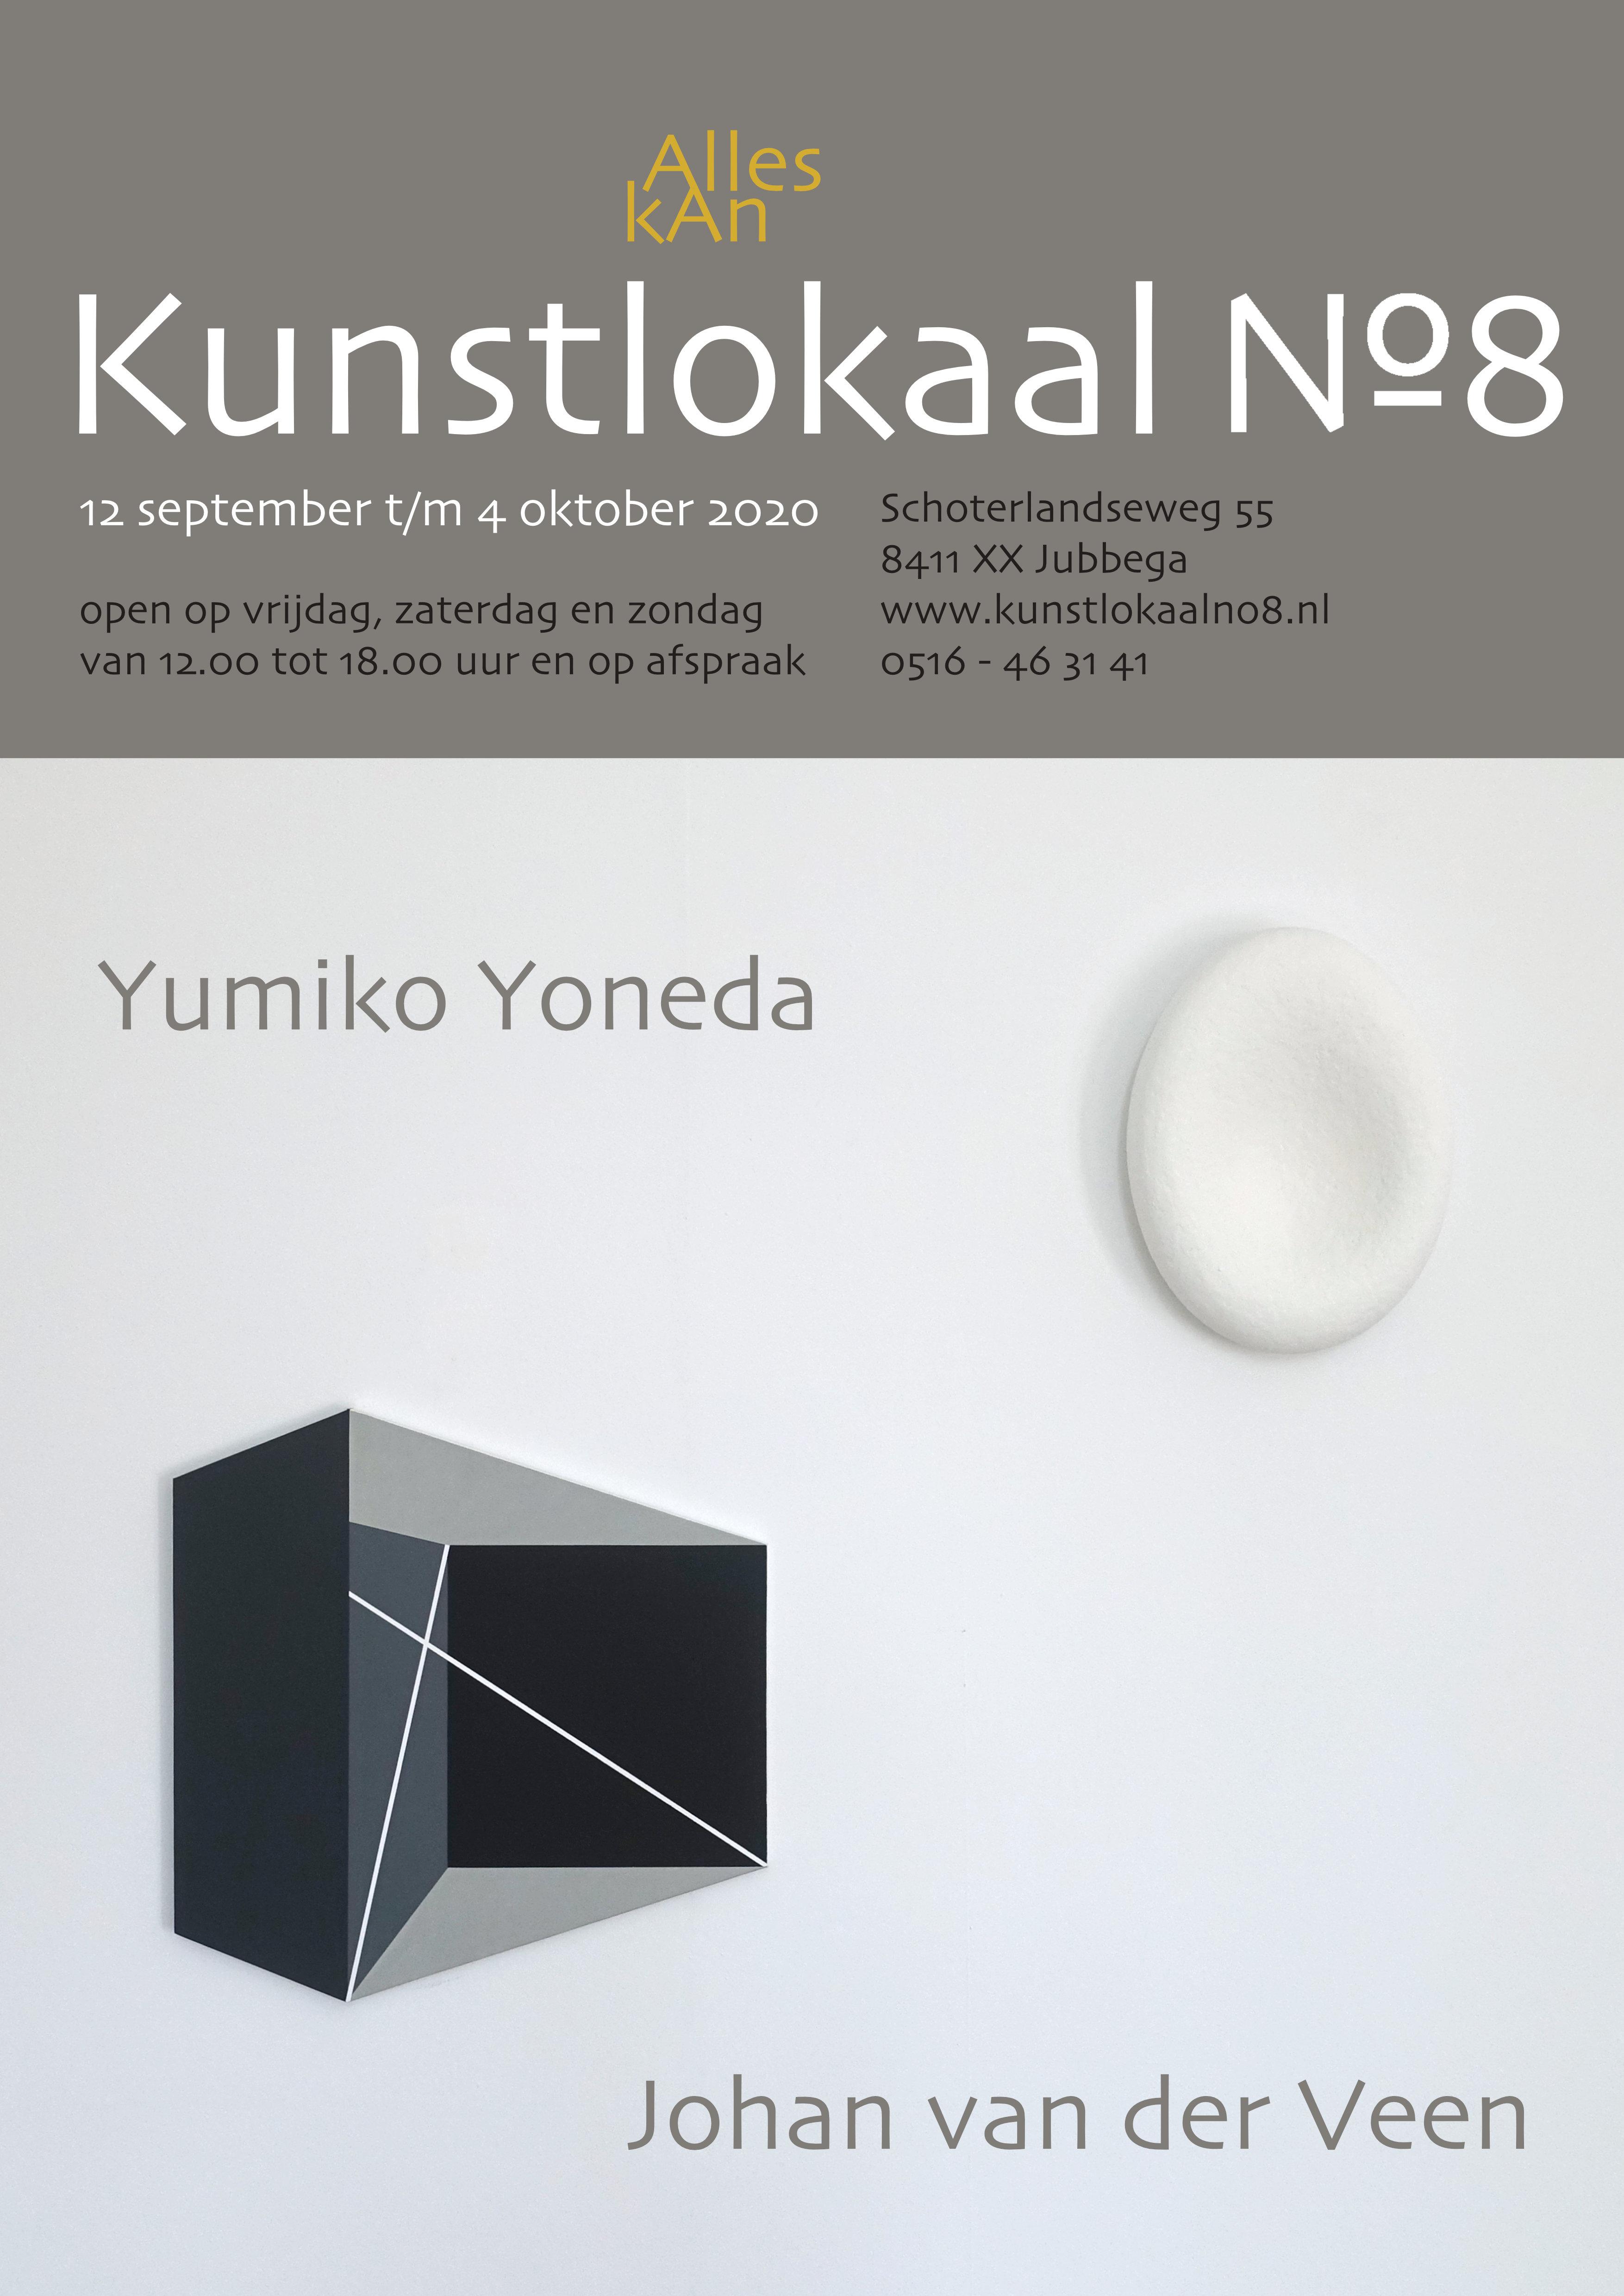 Affiche Yumiko Yoneda | Johan van der Veen